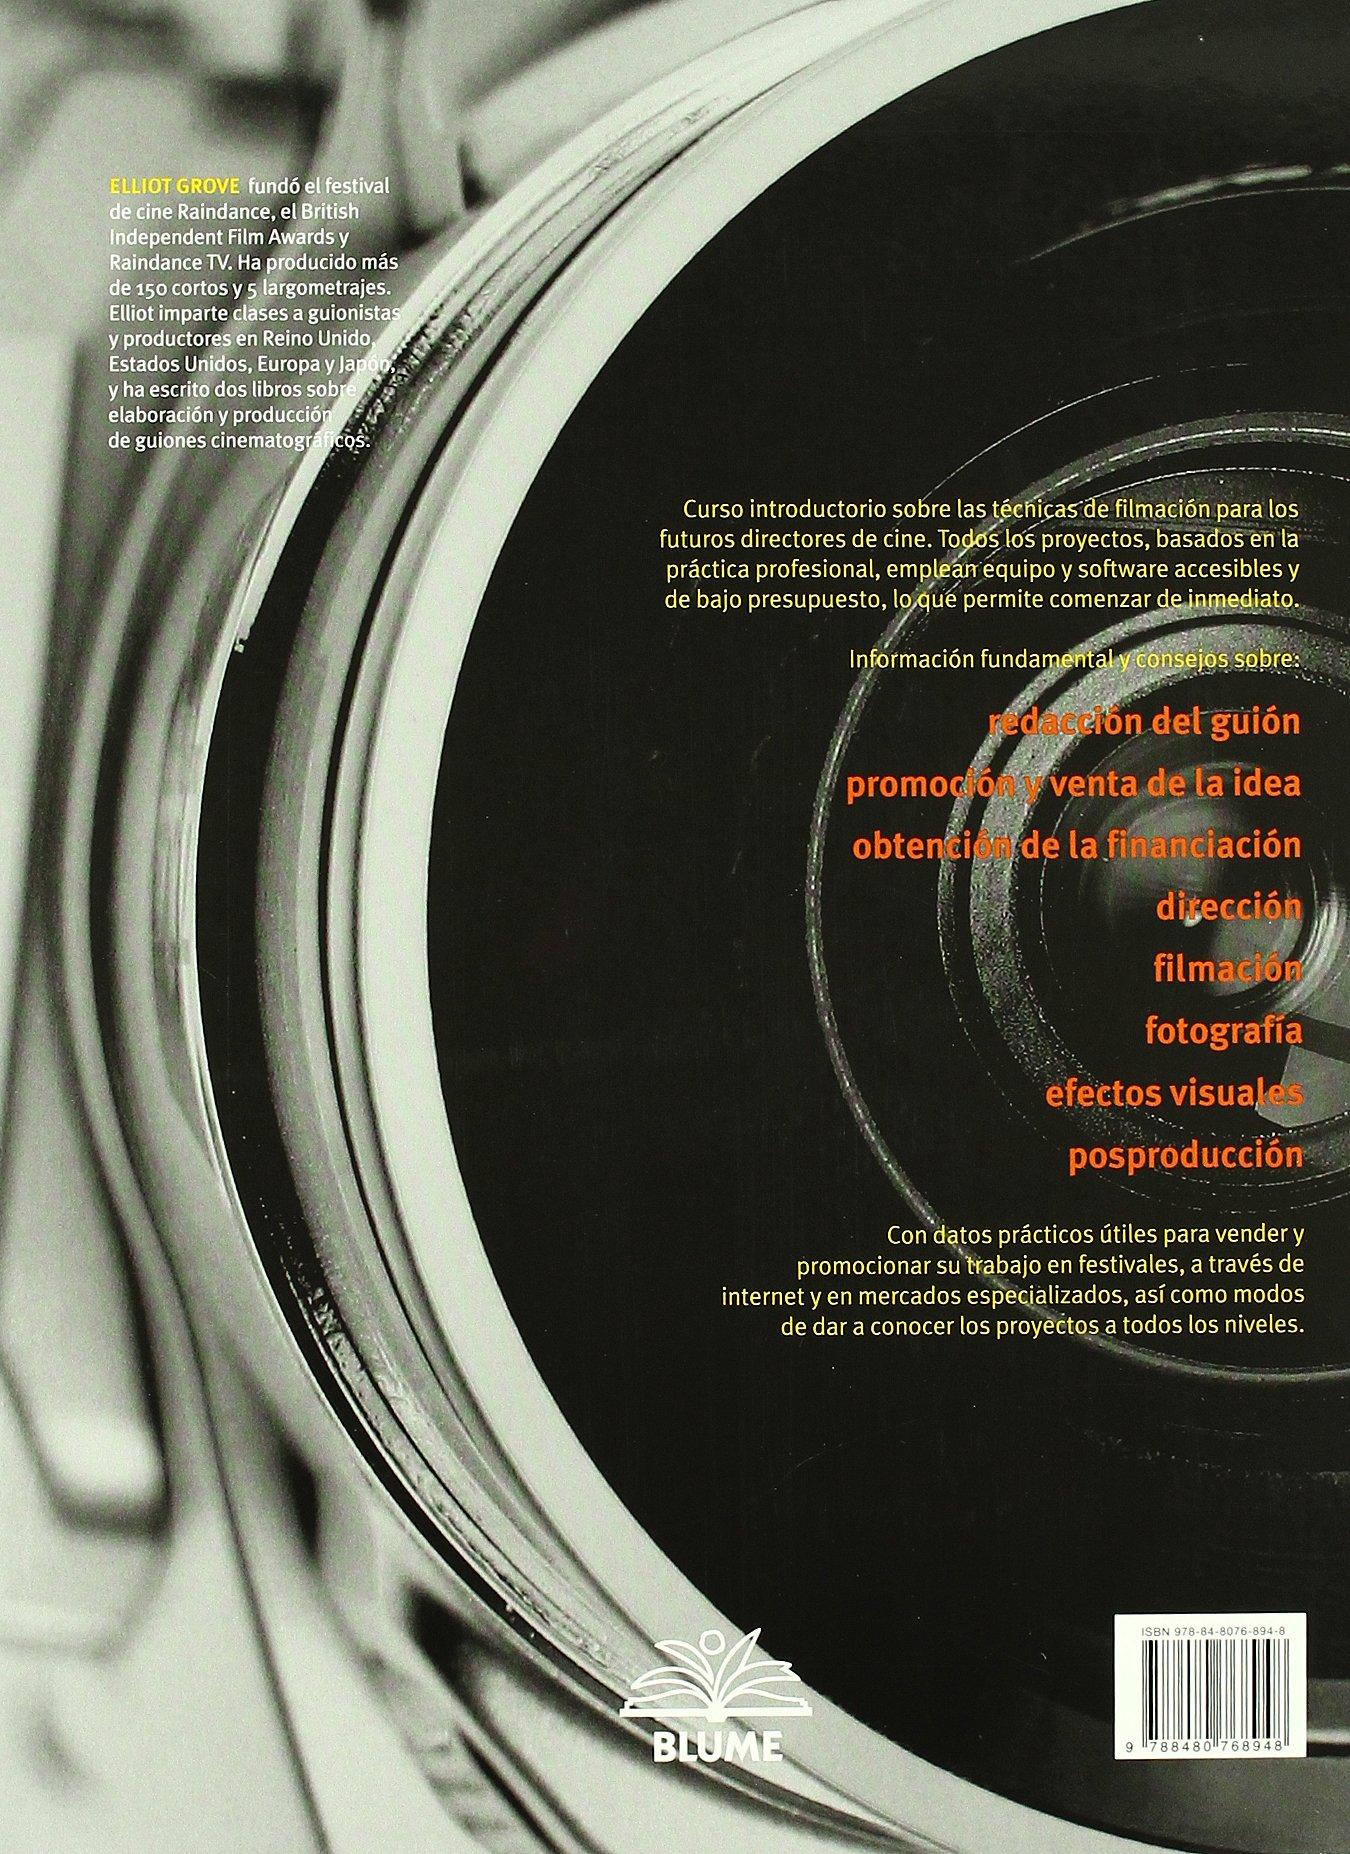 130 Proyectos de Iniciacion al Rodaje de Peliculas: del Guion a l a Postproduccion: ELLIOT GROVE: 9788480768948: Amazon.com: Books